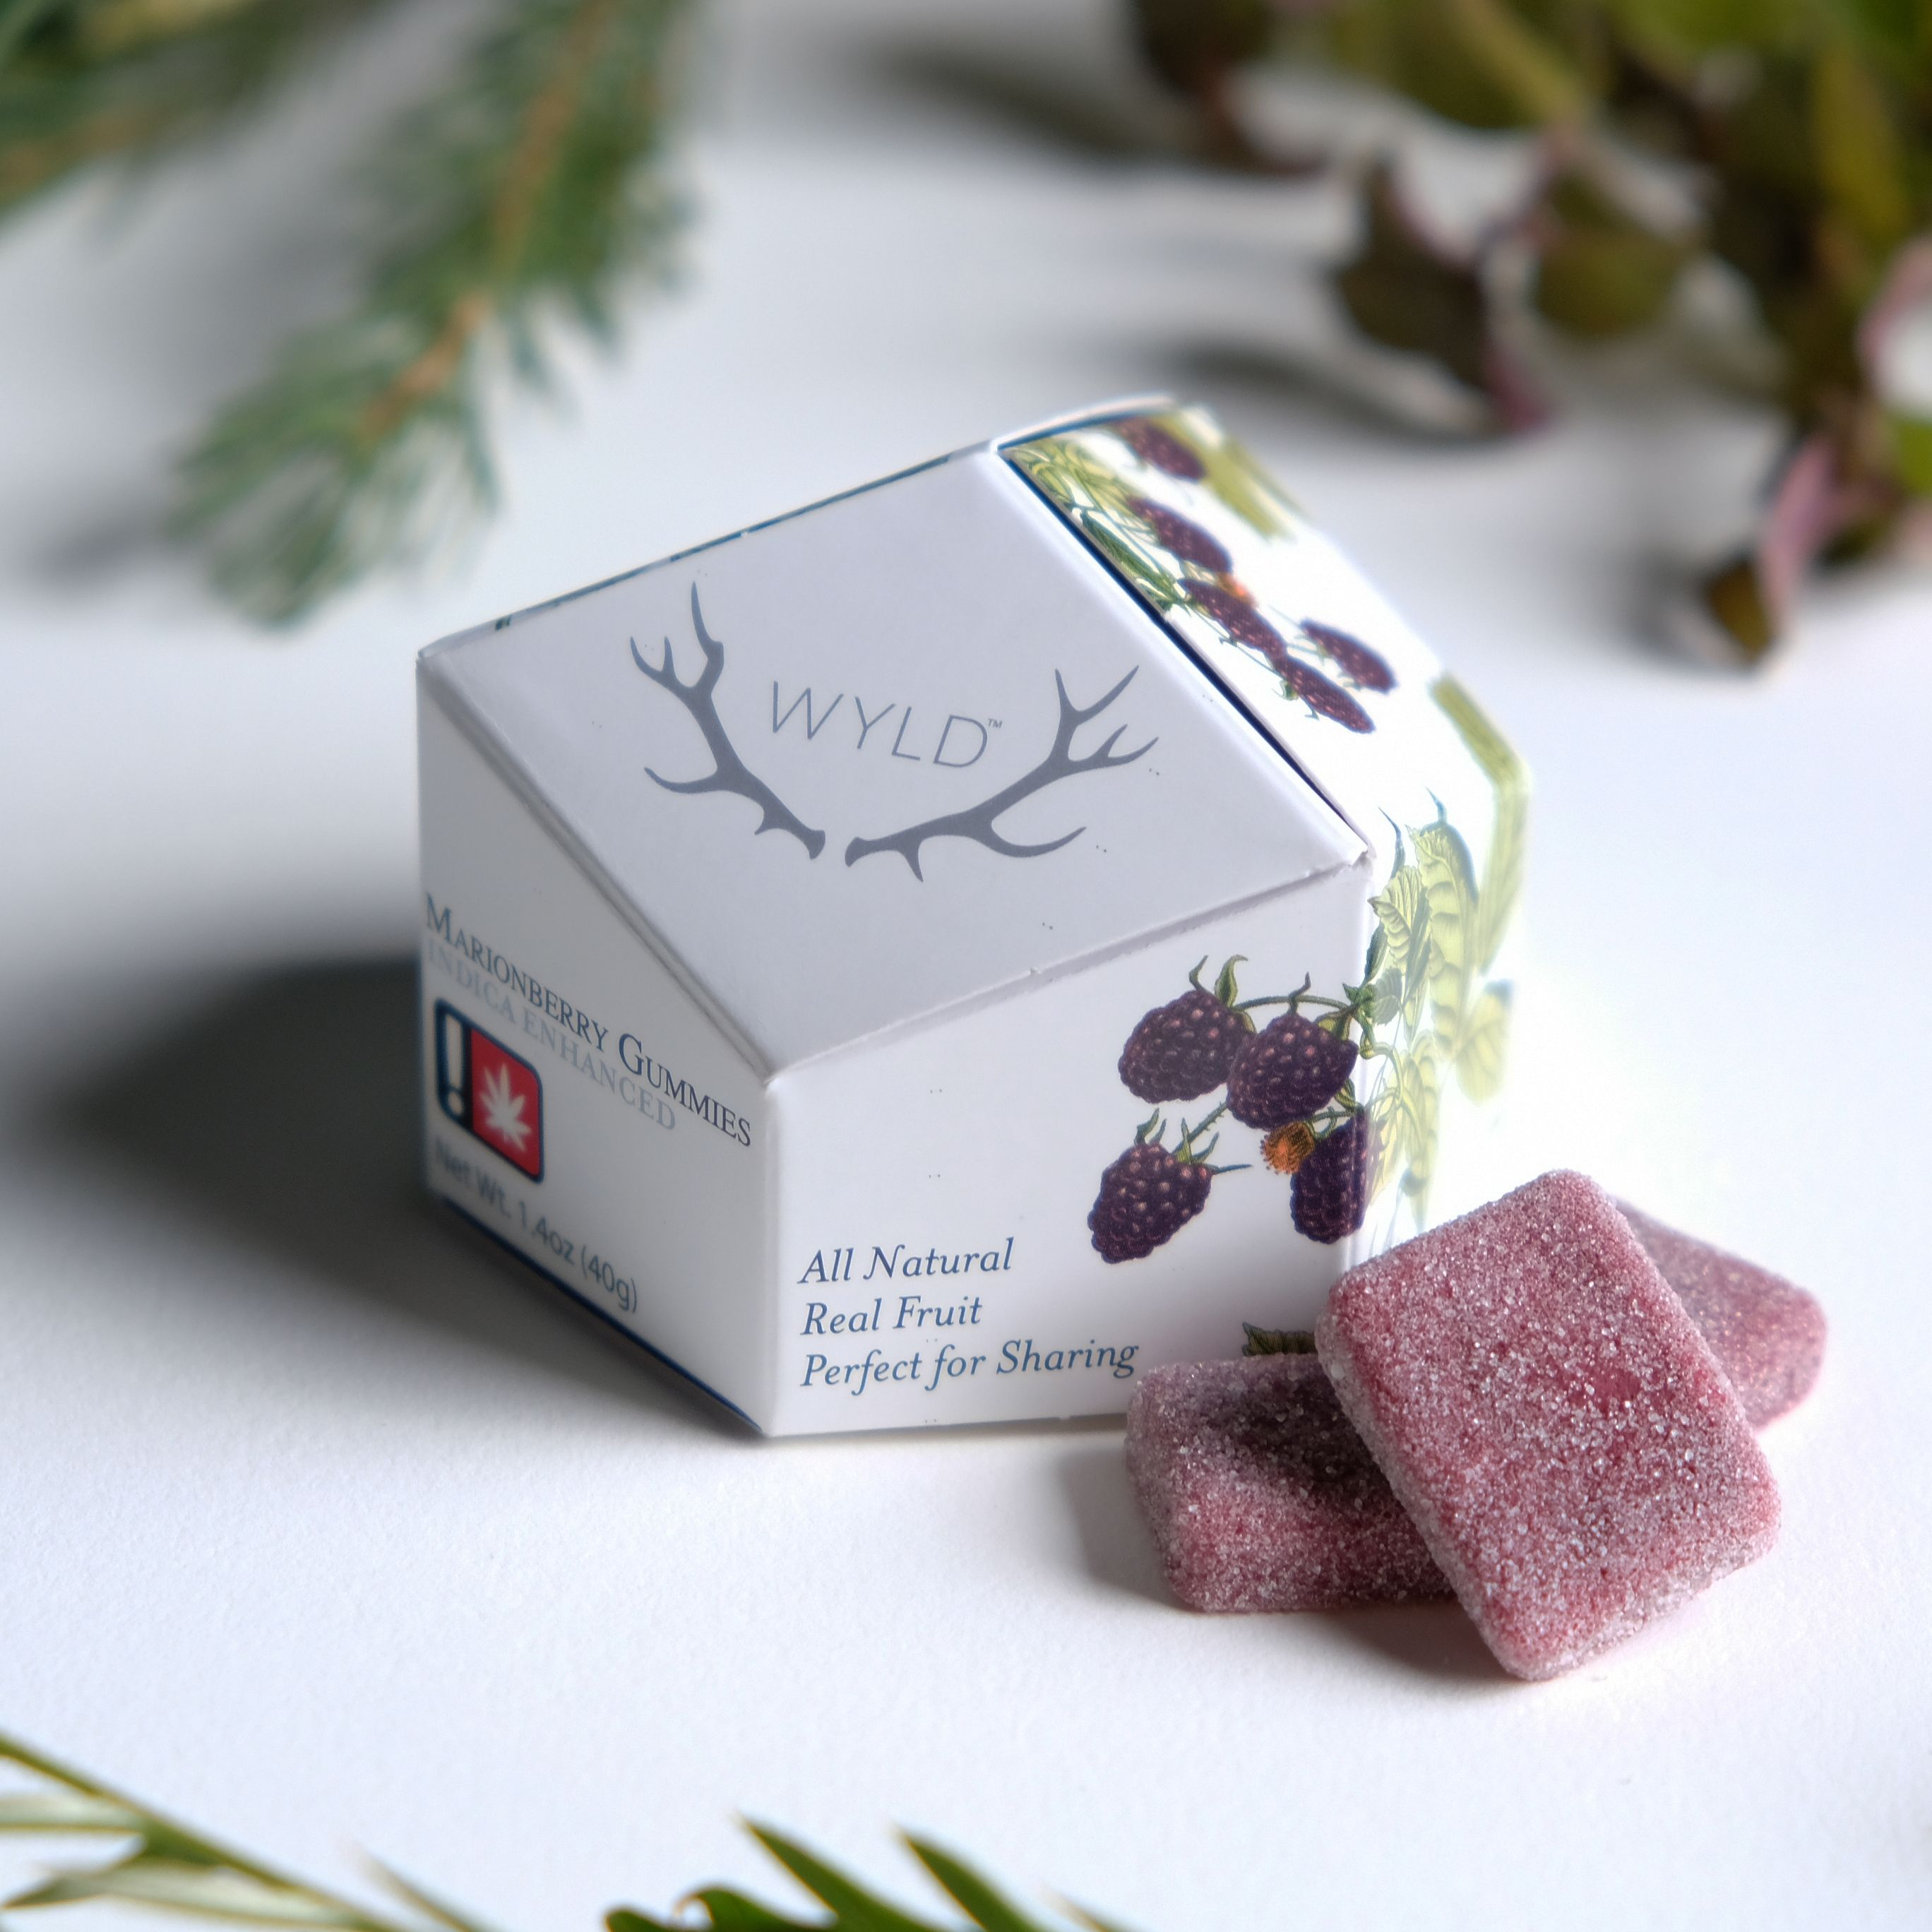 Wyld - Marionberry Gummies (Indica)